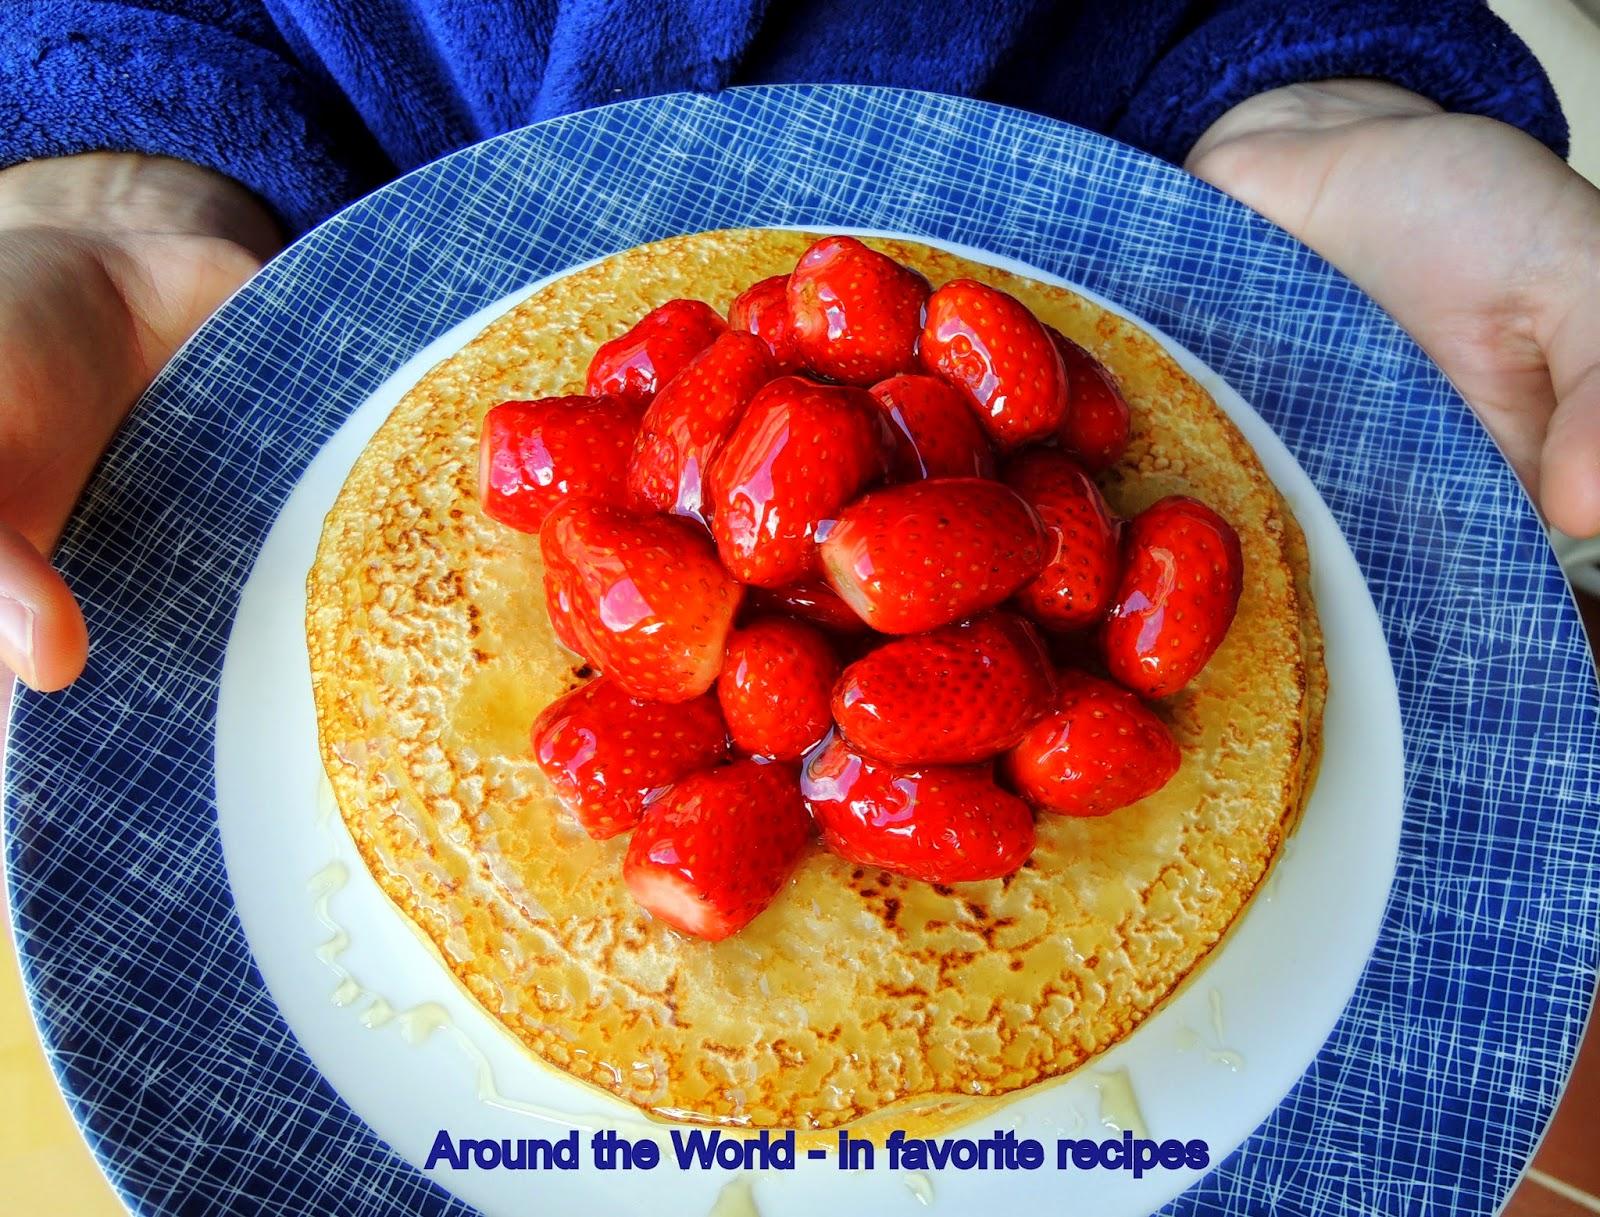 Banana Oatmeal Pancakes (Gluten Free and Flourless)